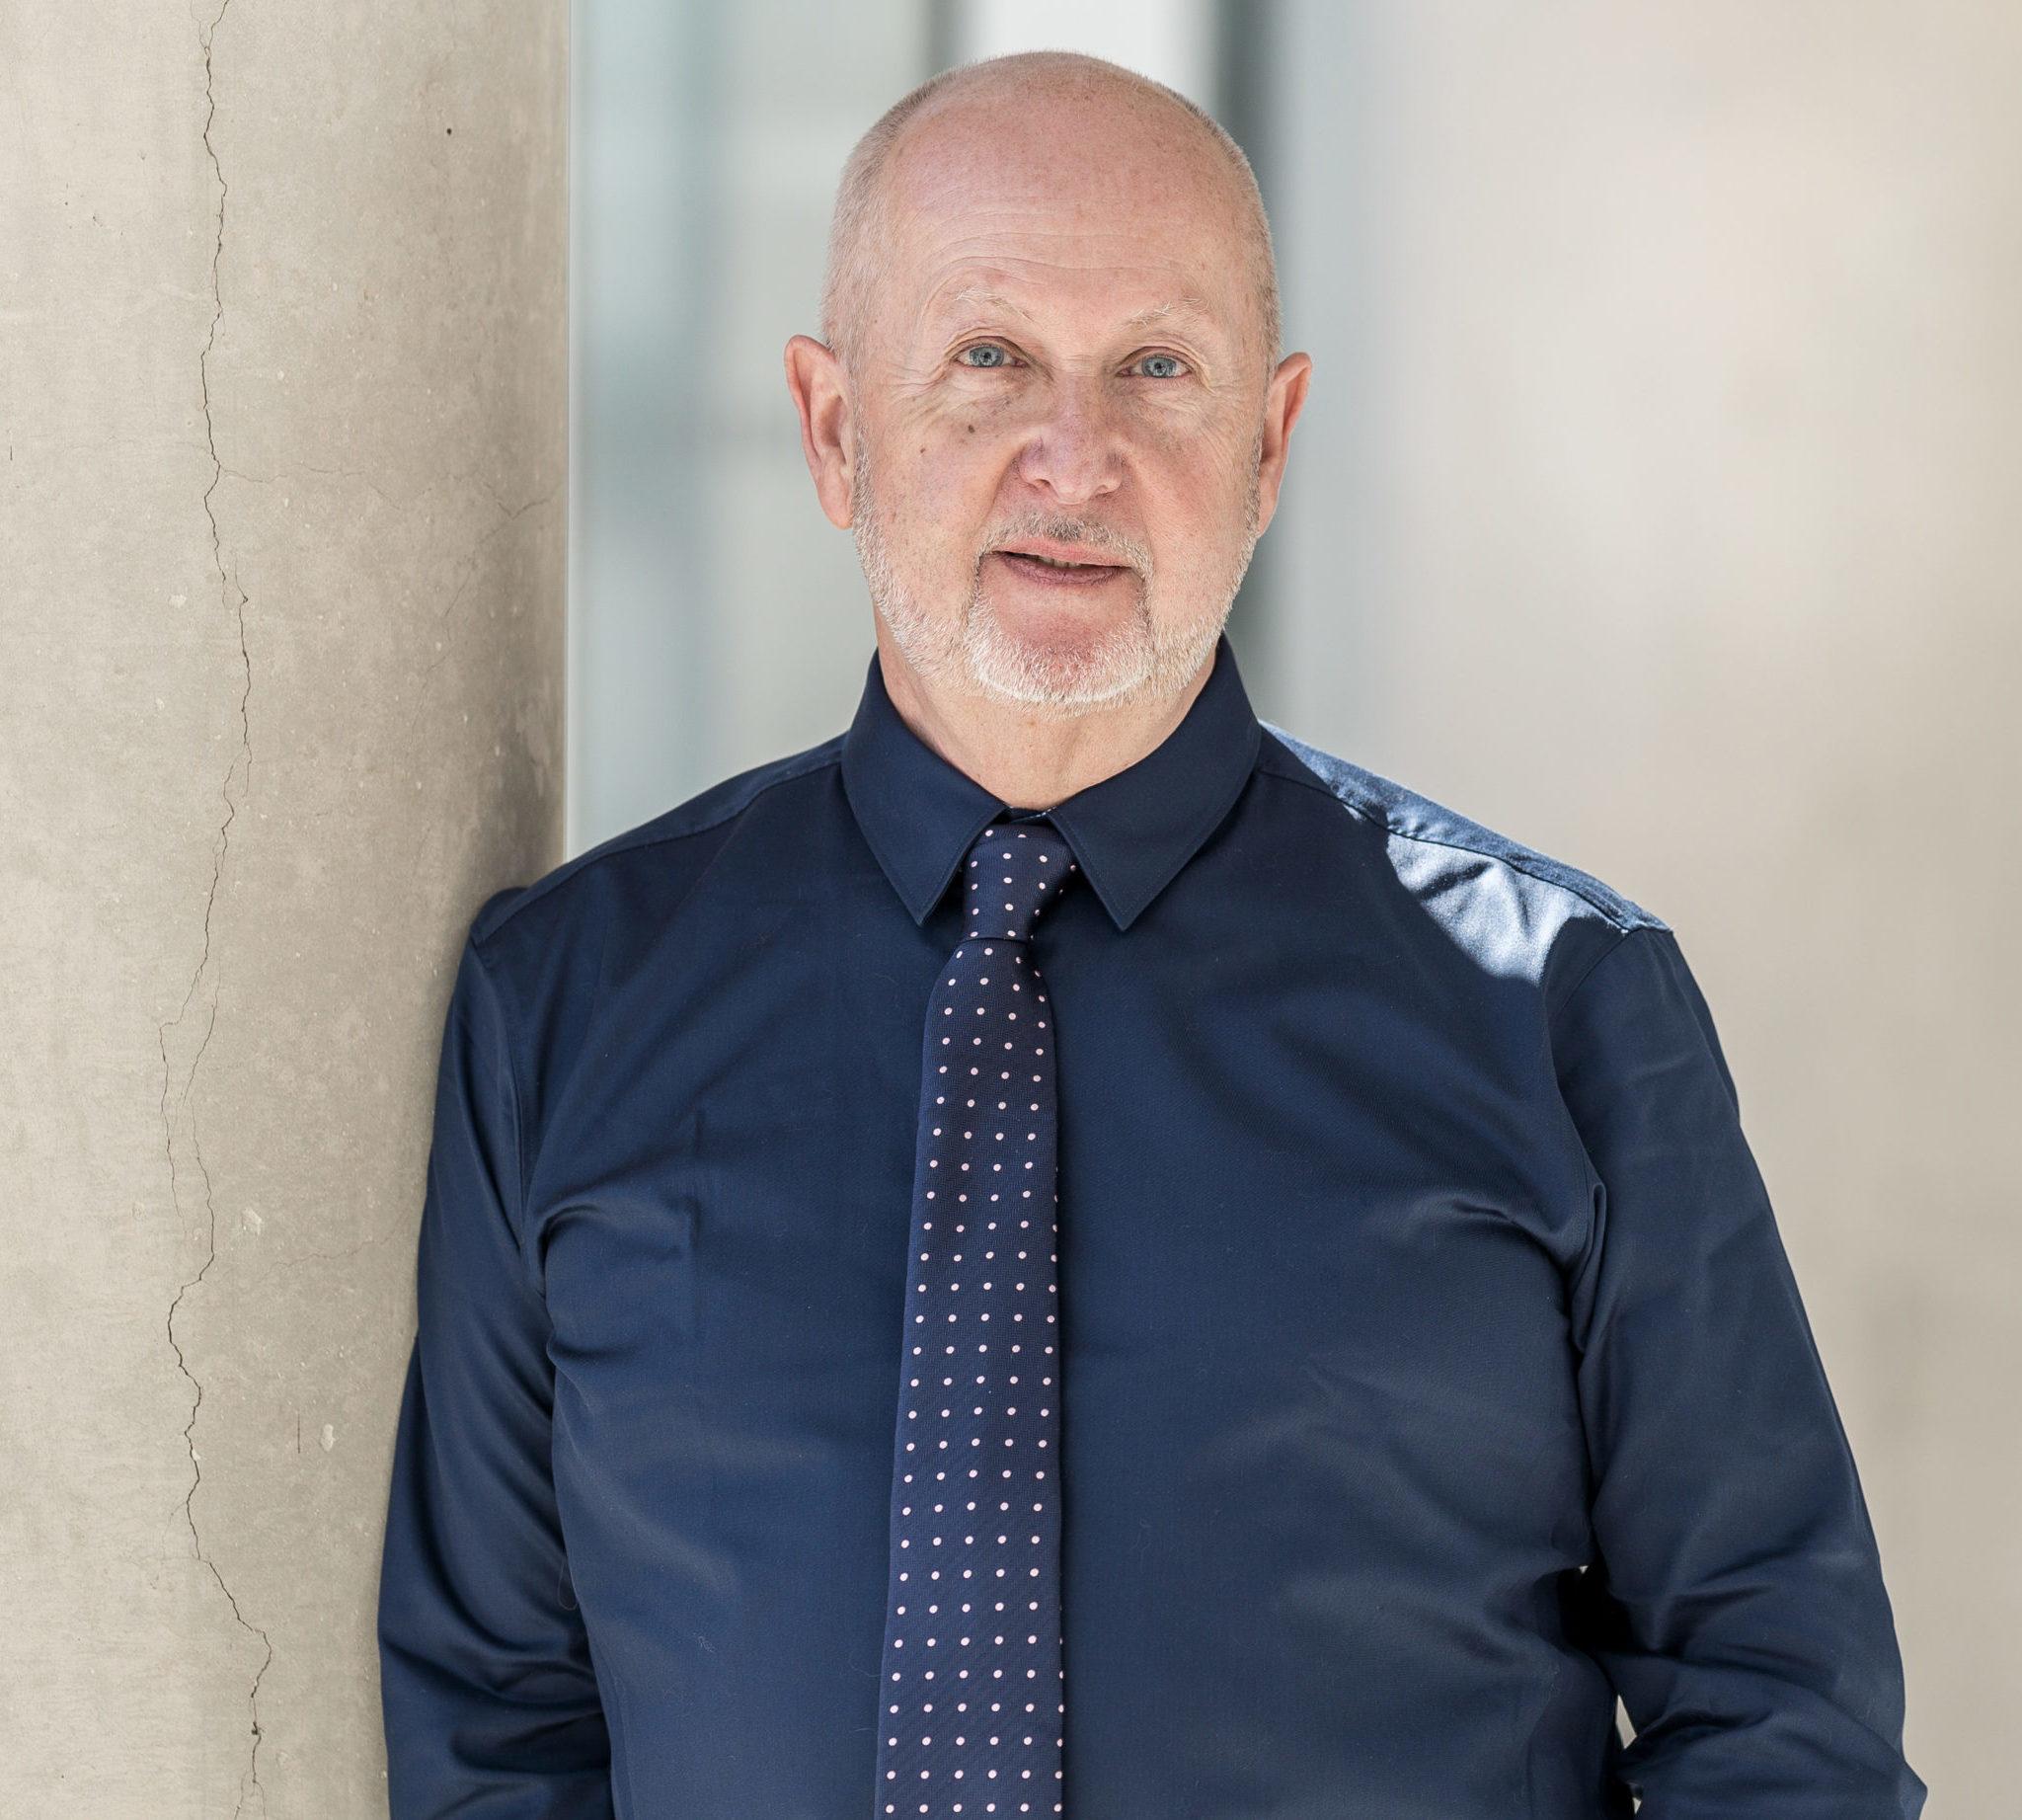 Jim Ryan, Partner at Acuity Law